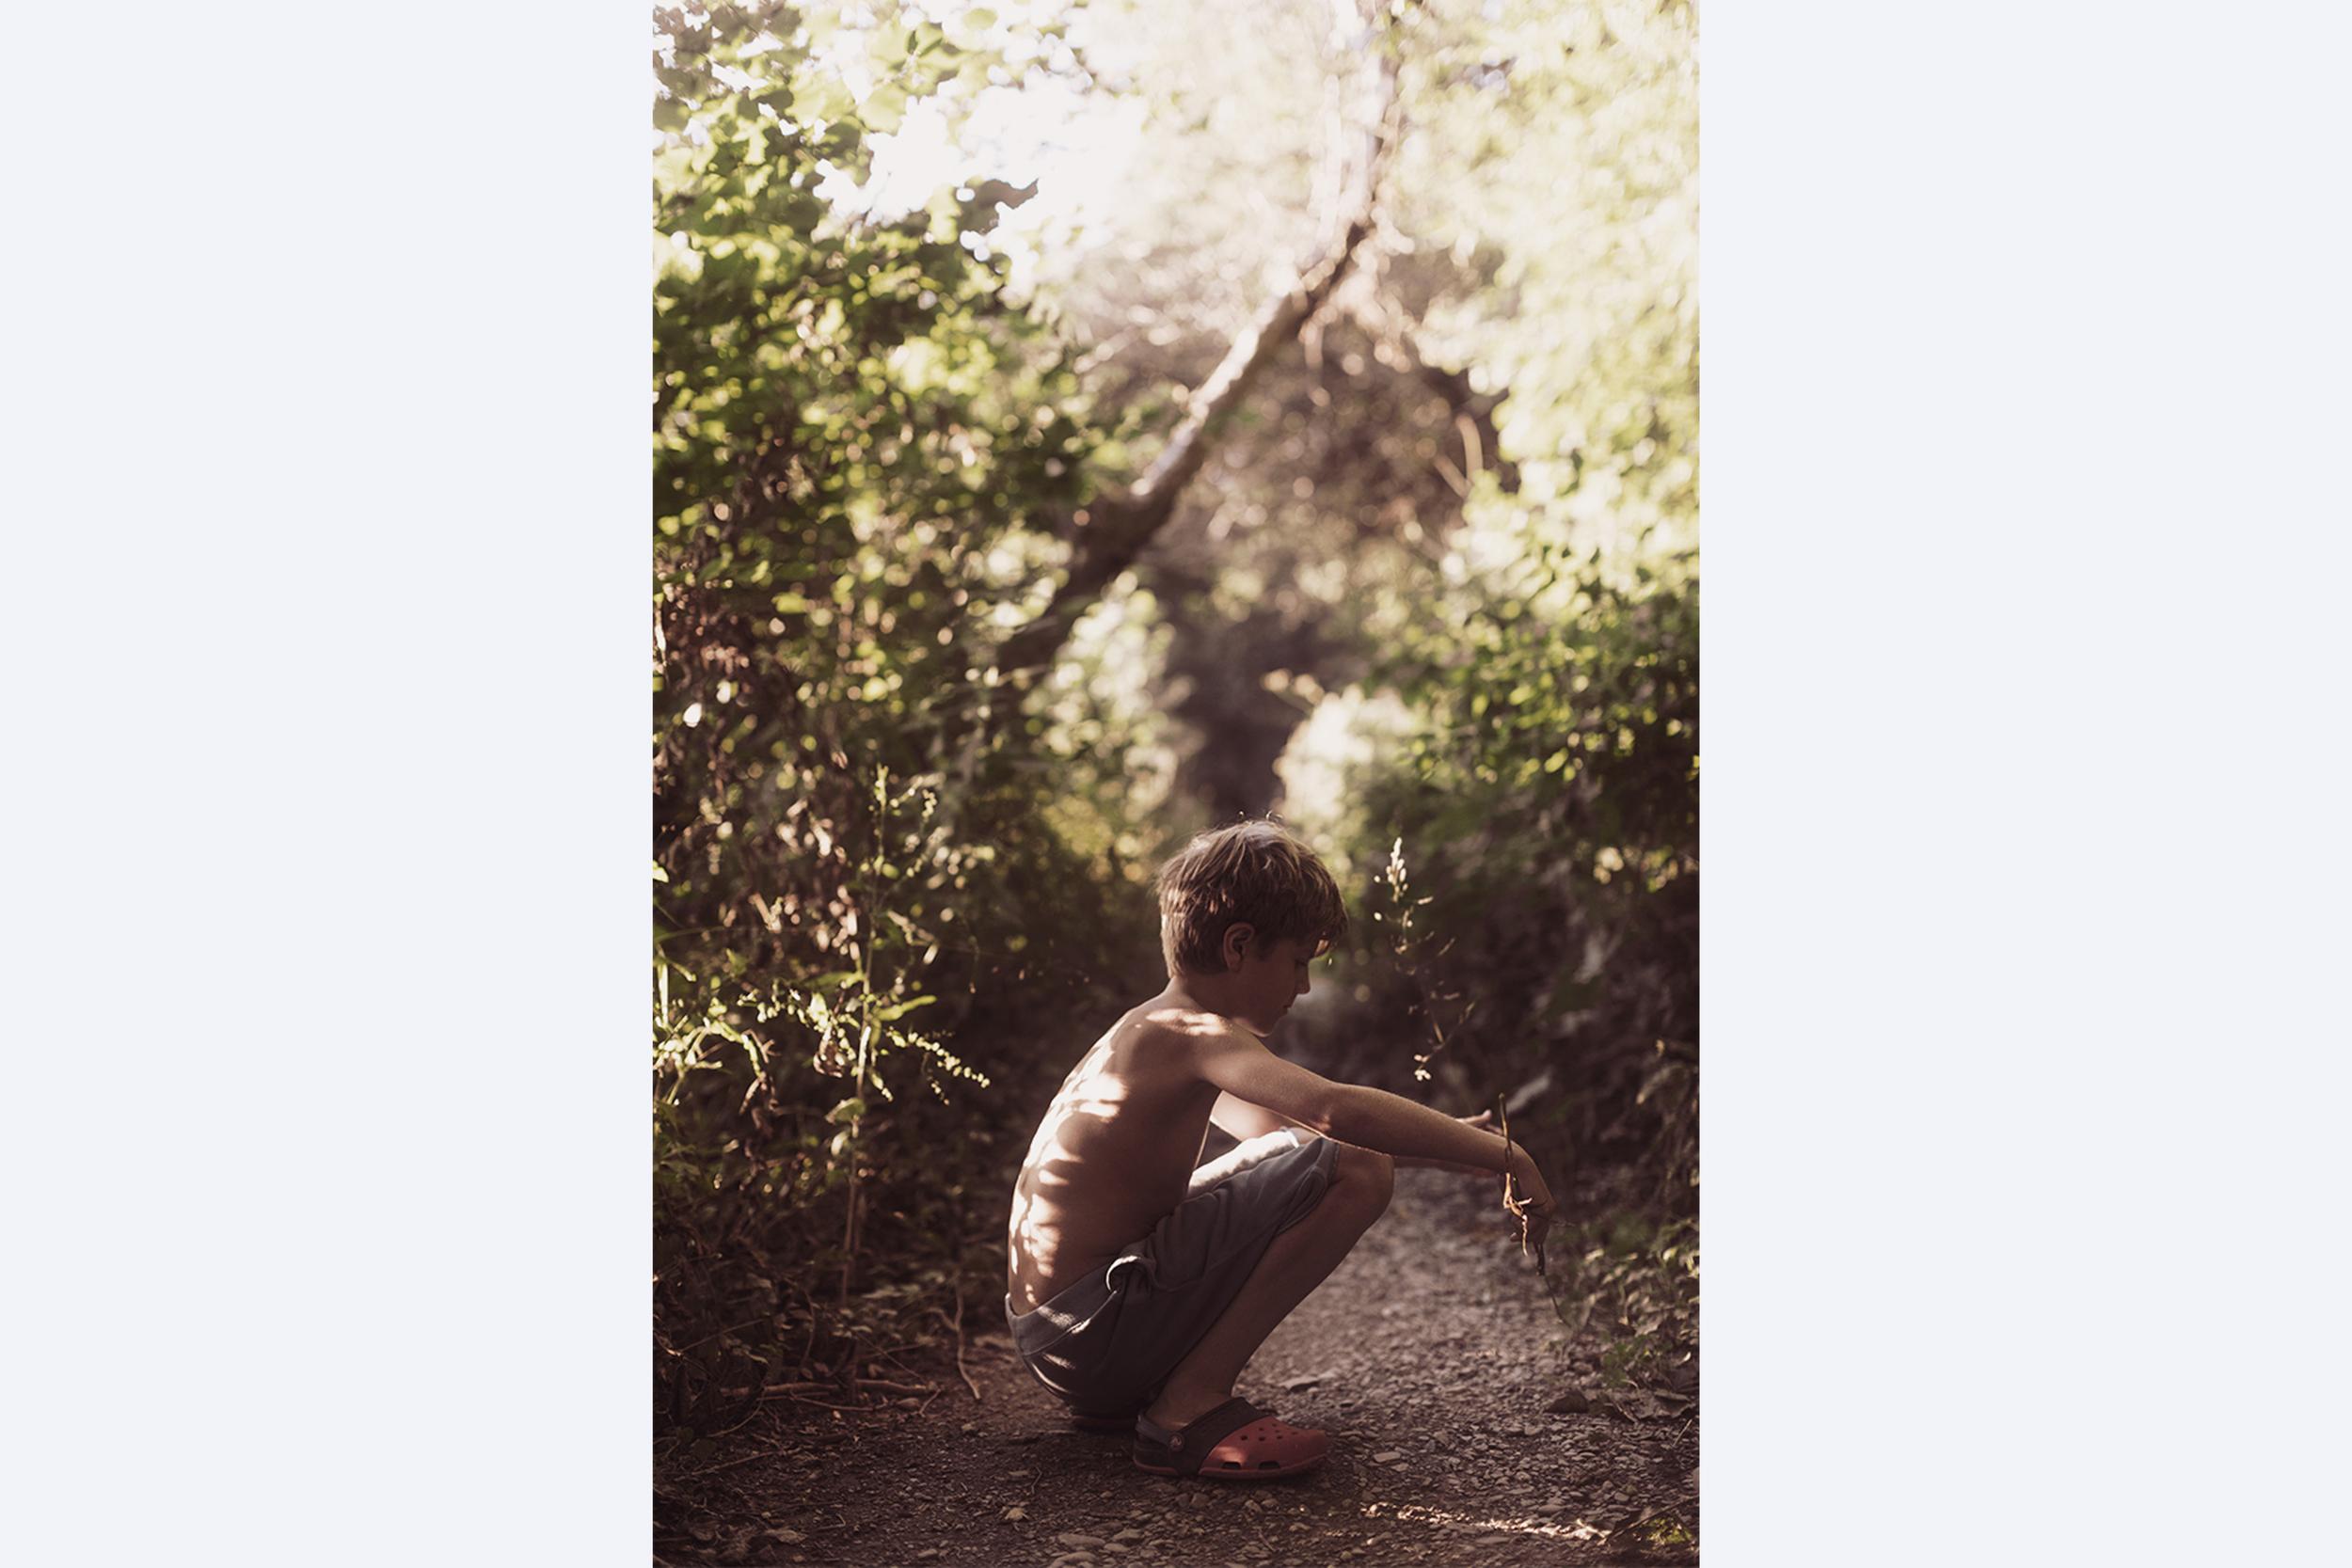 Boyhood_Philip_E_James_3.jpg